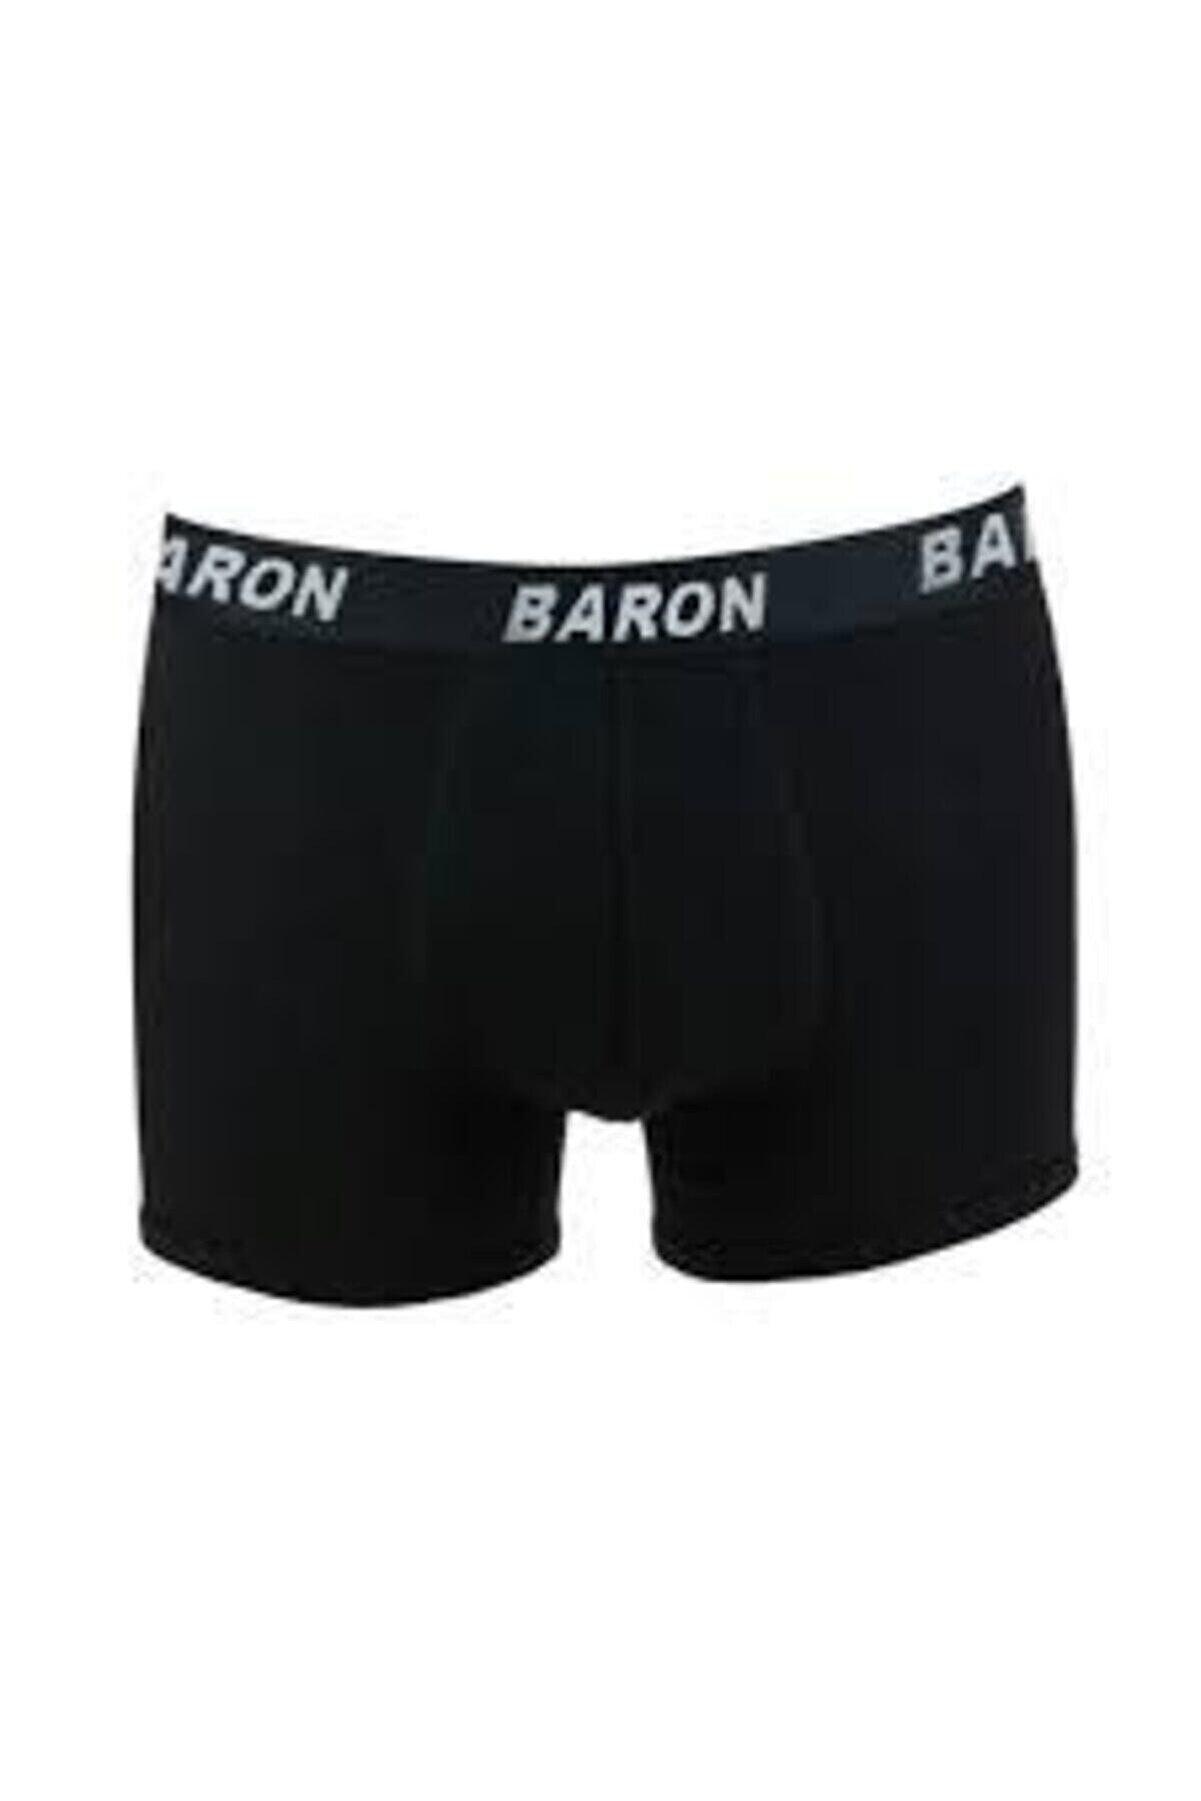 Zümra Baron Boxer Erkek Siyah Elestan Likralı Penye Boxer Siyah 1'li Paket